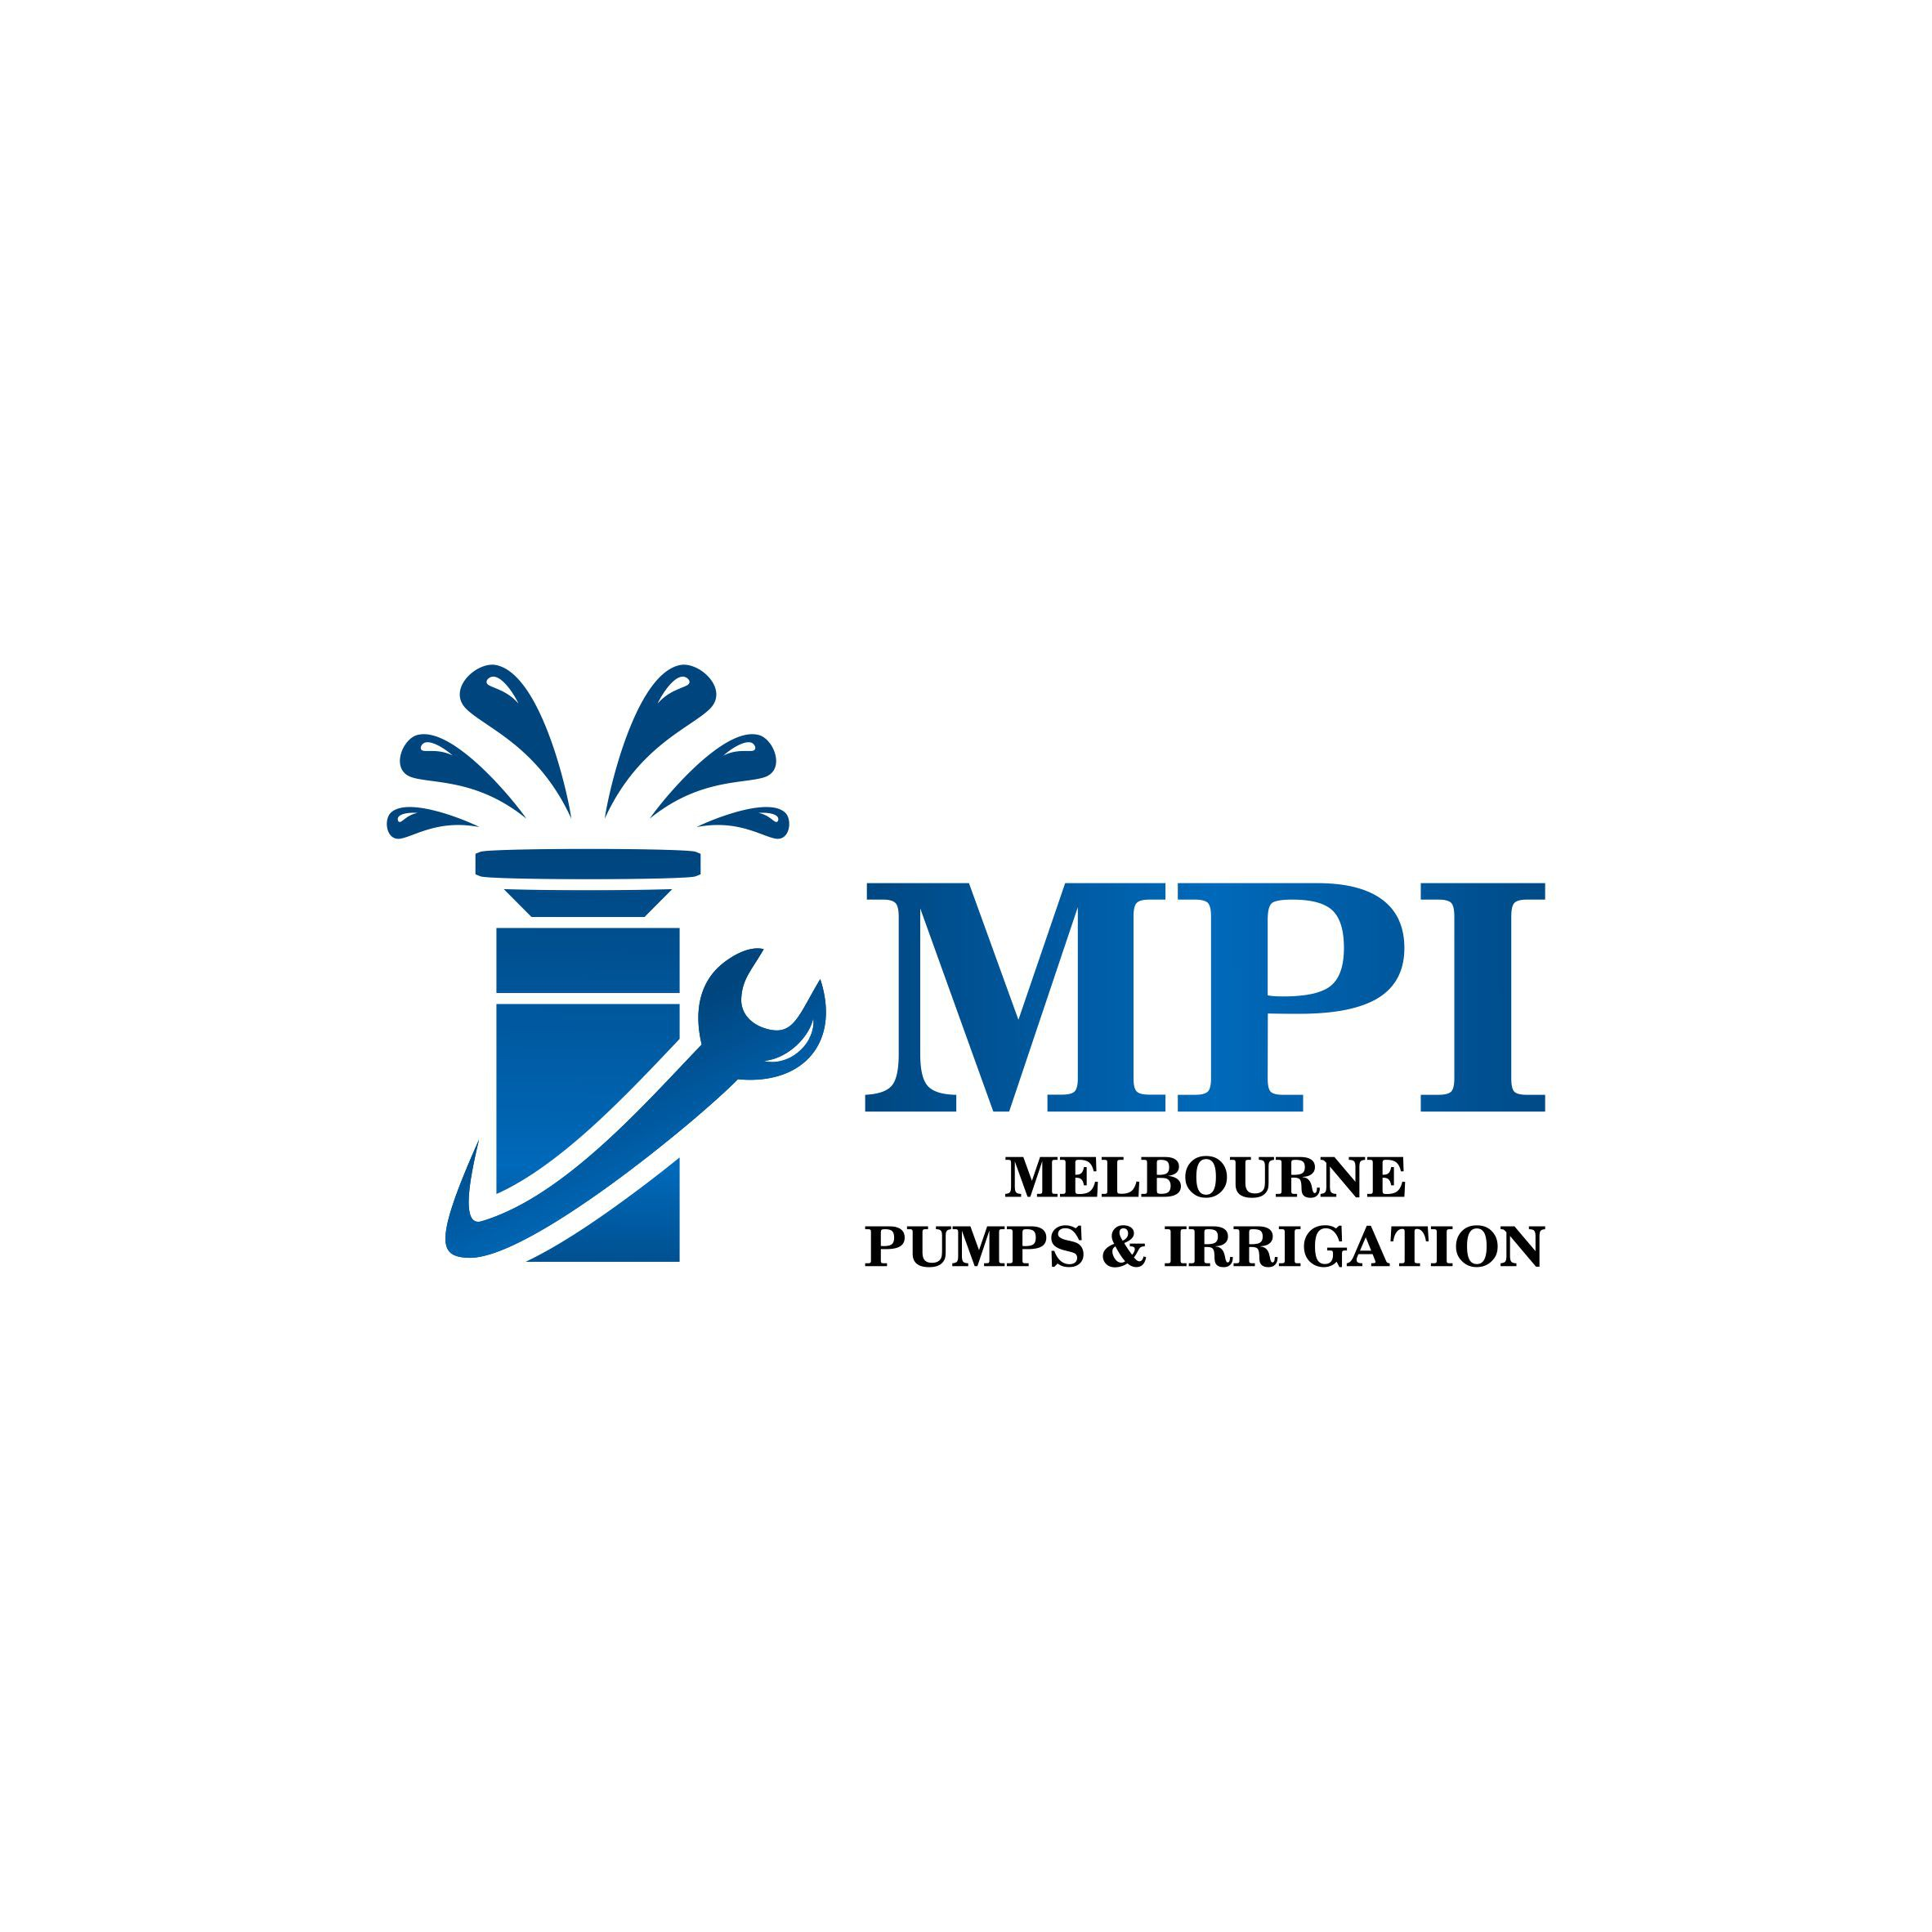 pump and irrigation service company needs a logo